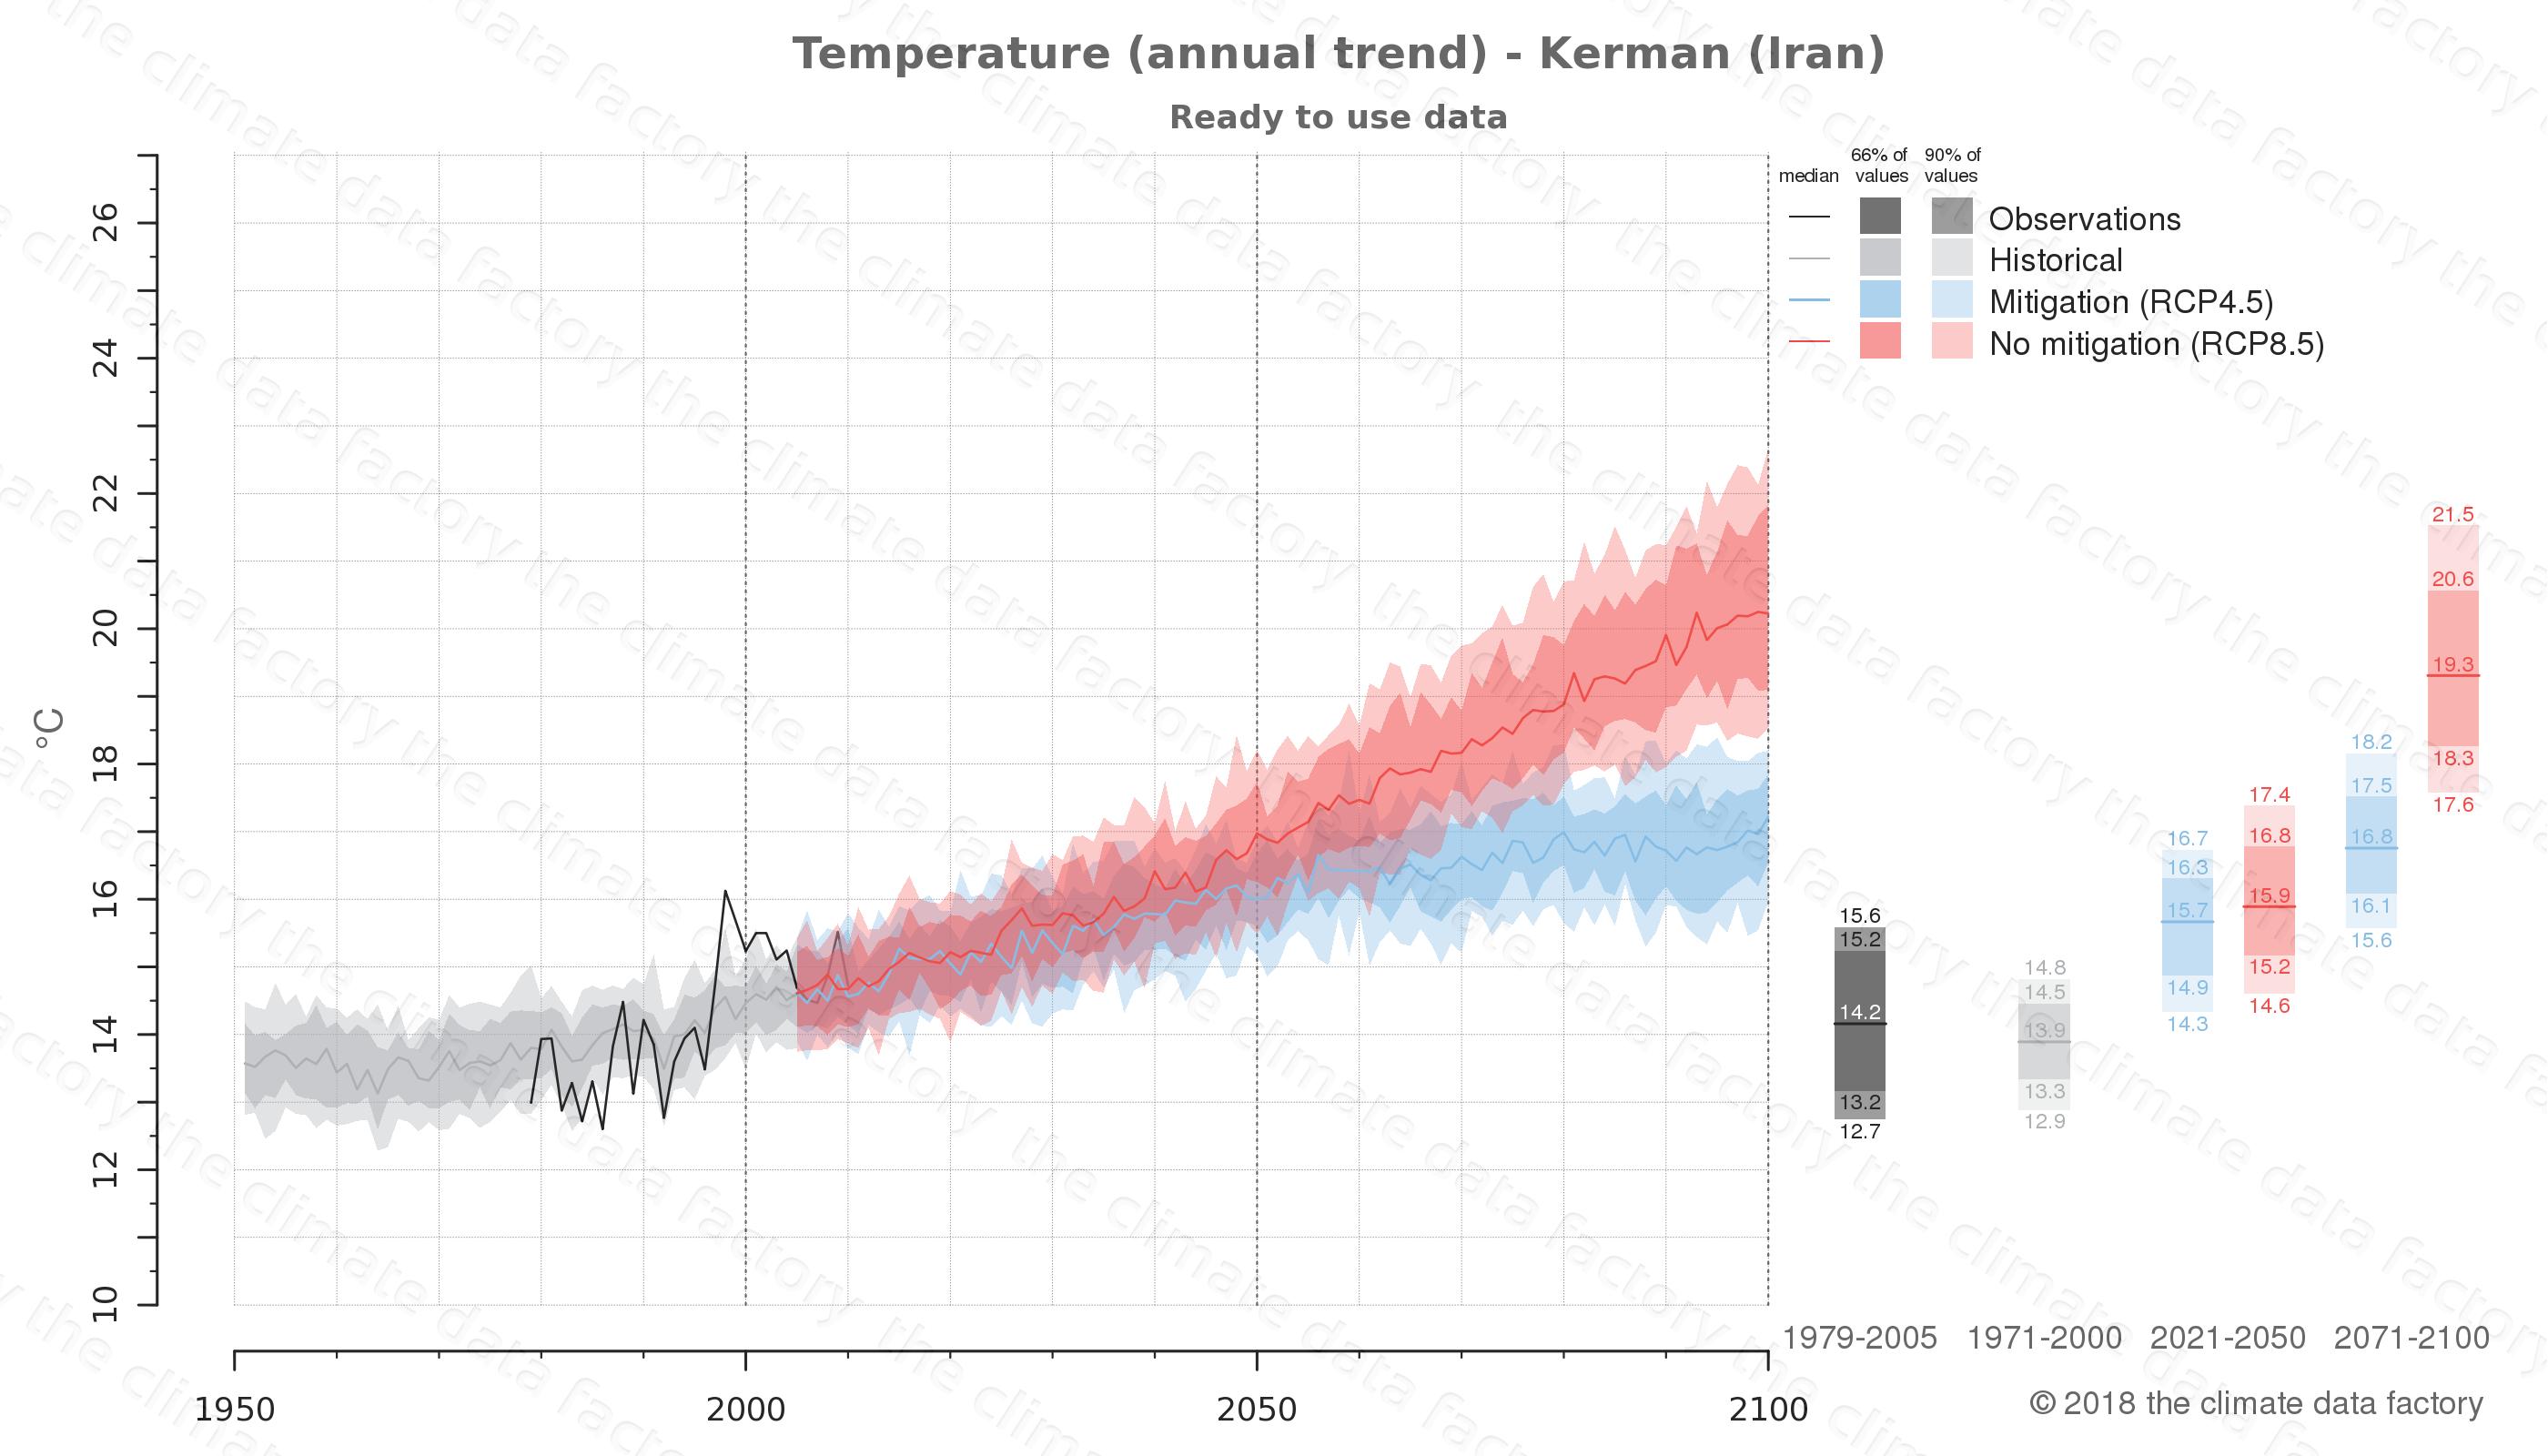 climate change data policy adaptation climate graph city data temperature kerman iran